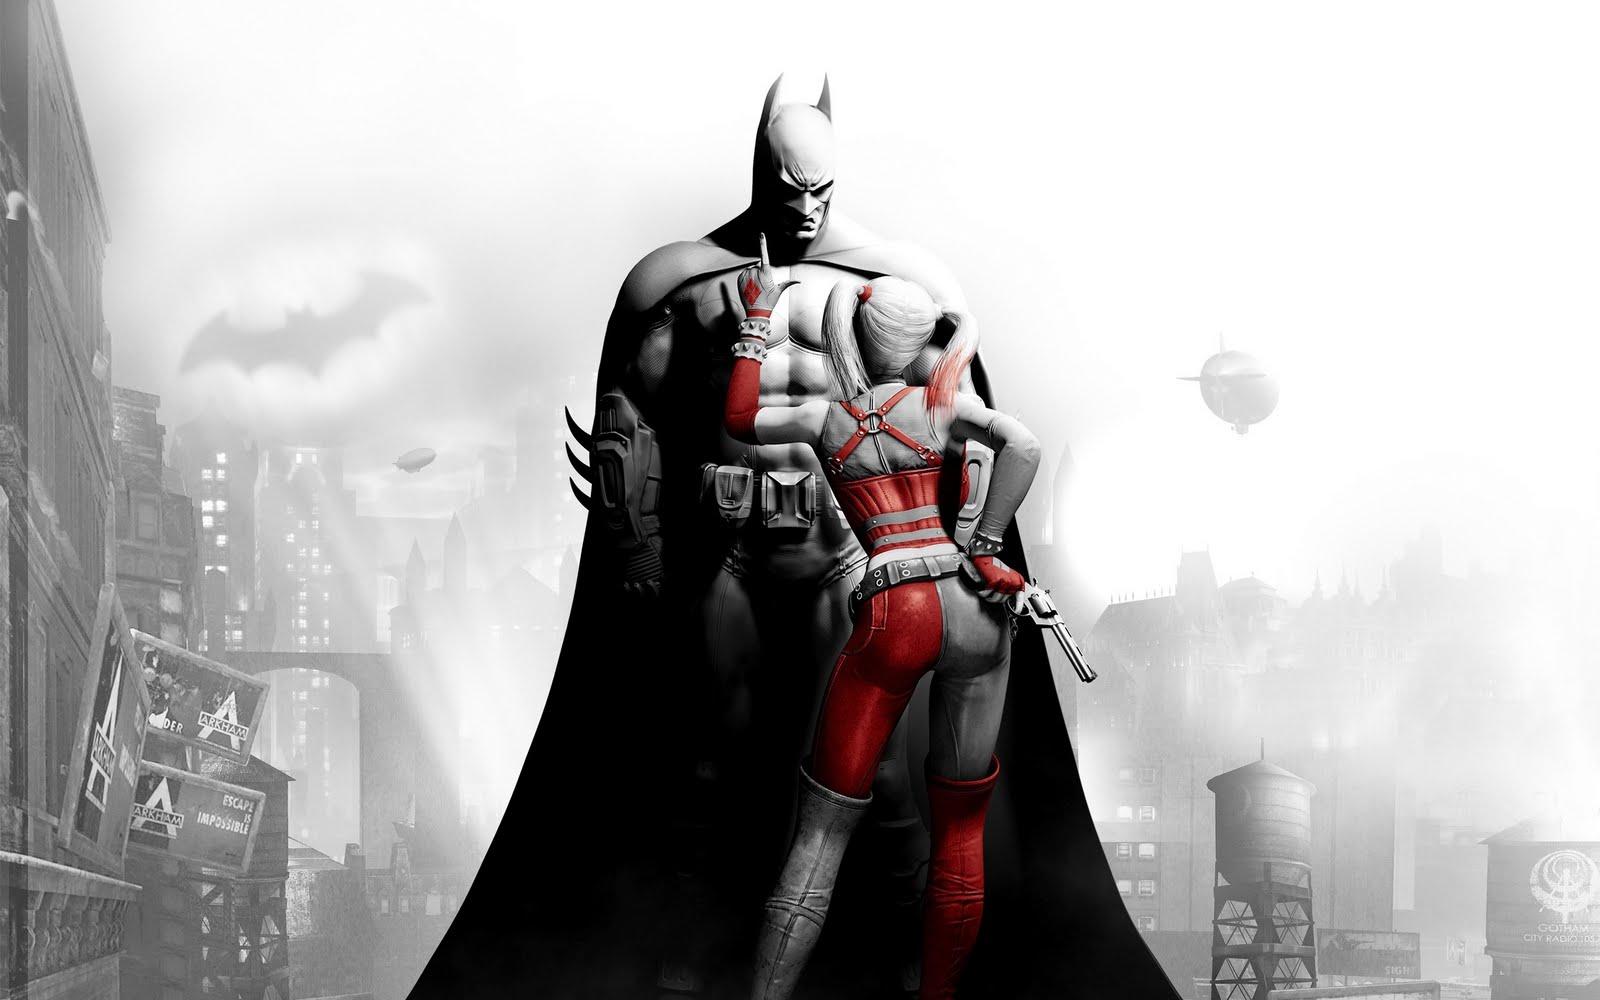 netphotosregistered photos5225 batman arkham city hd wallpapersjpg 1600x1000